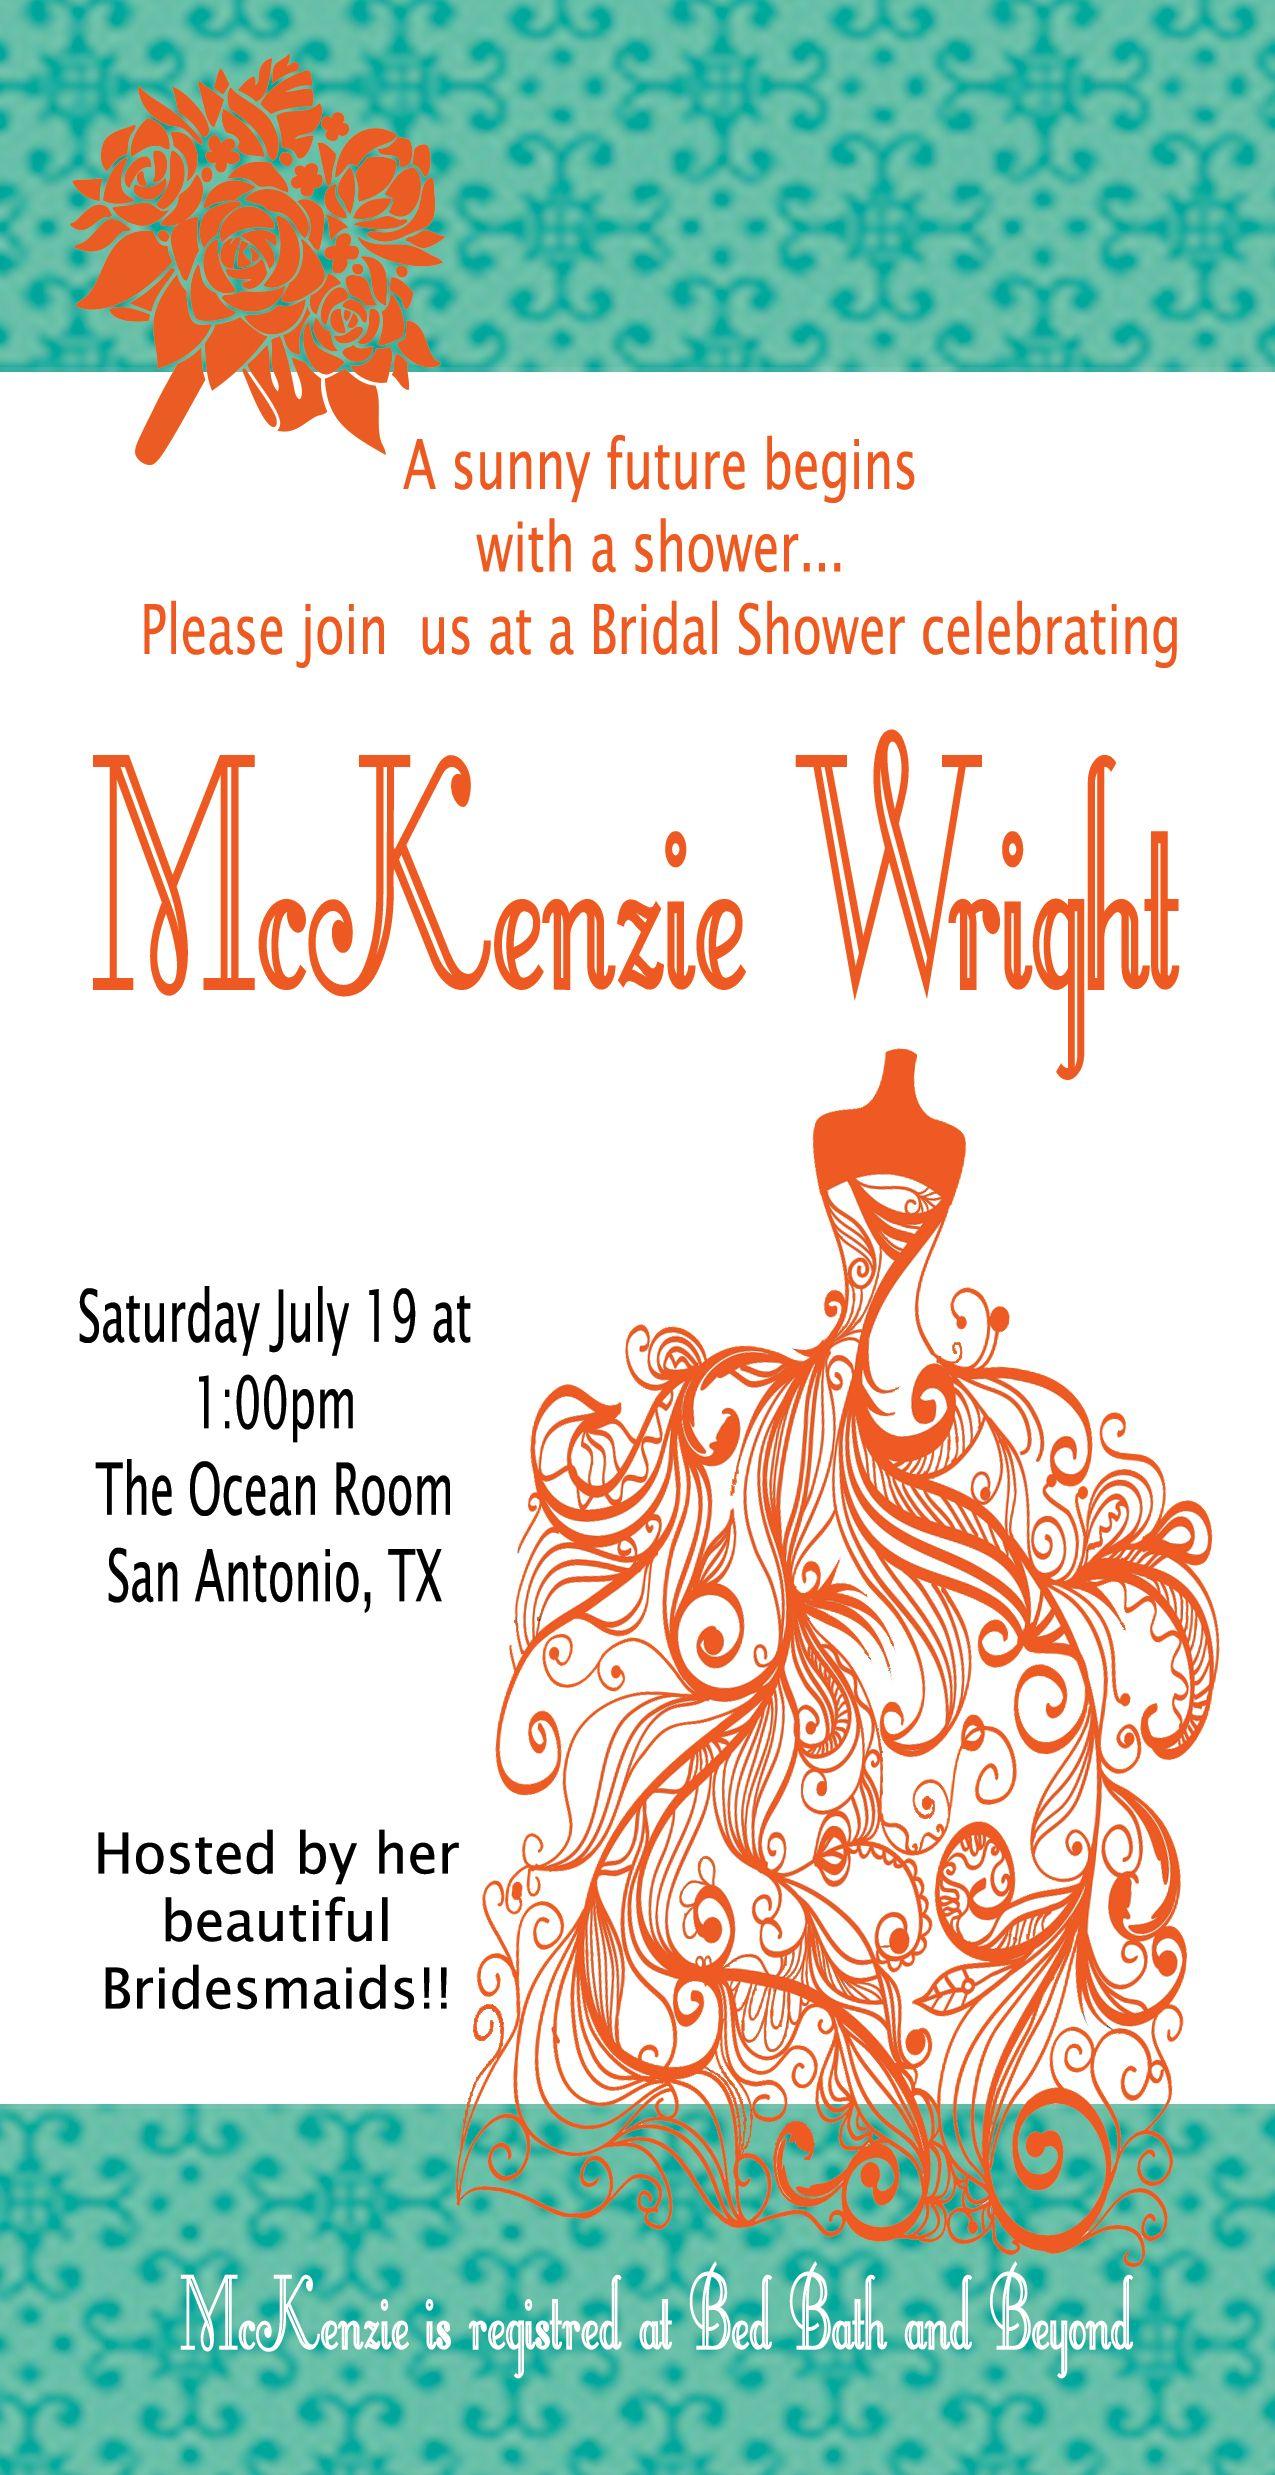 Bridal Shower Invitation Template #10